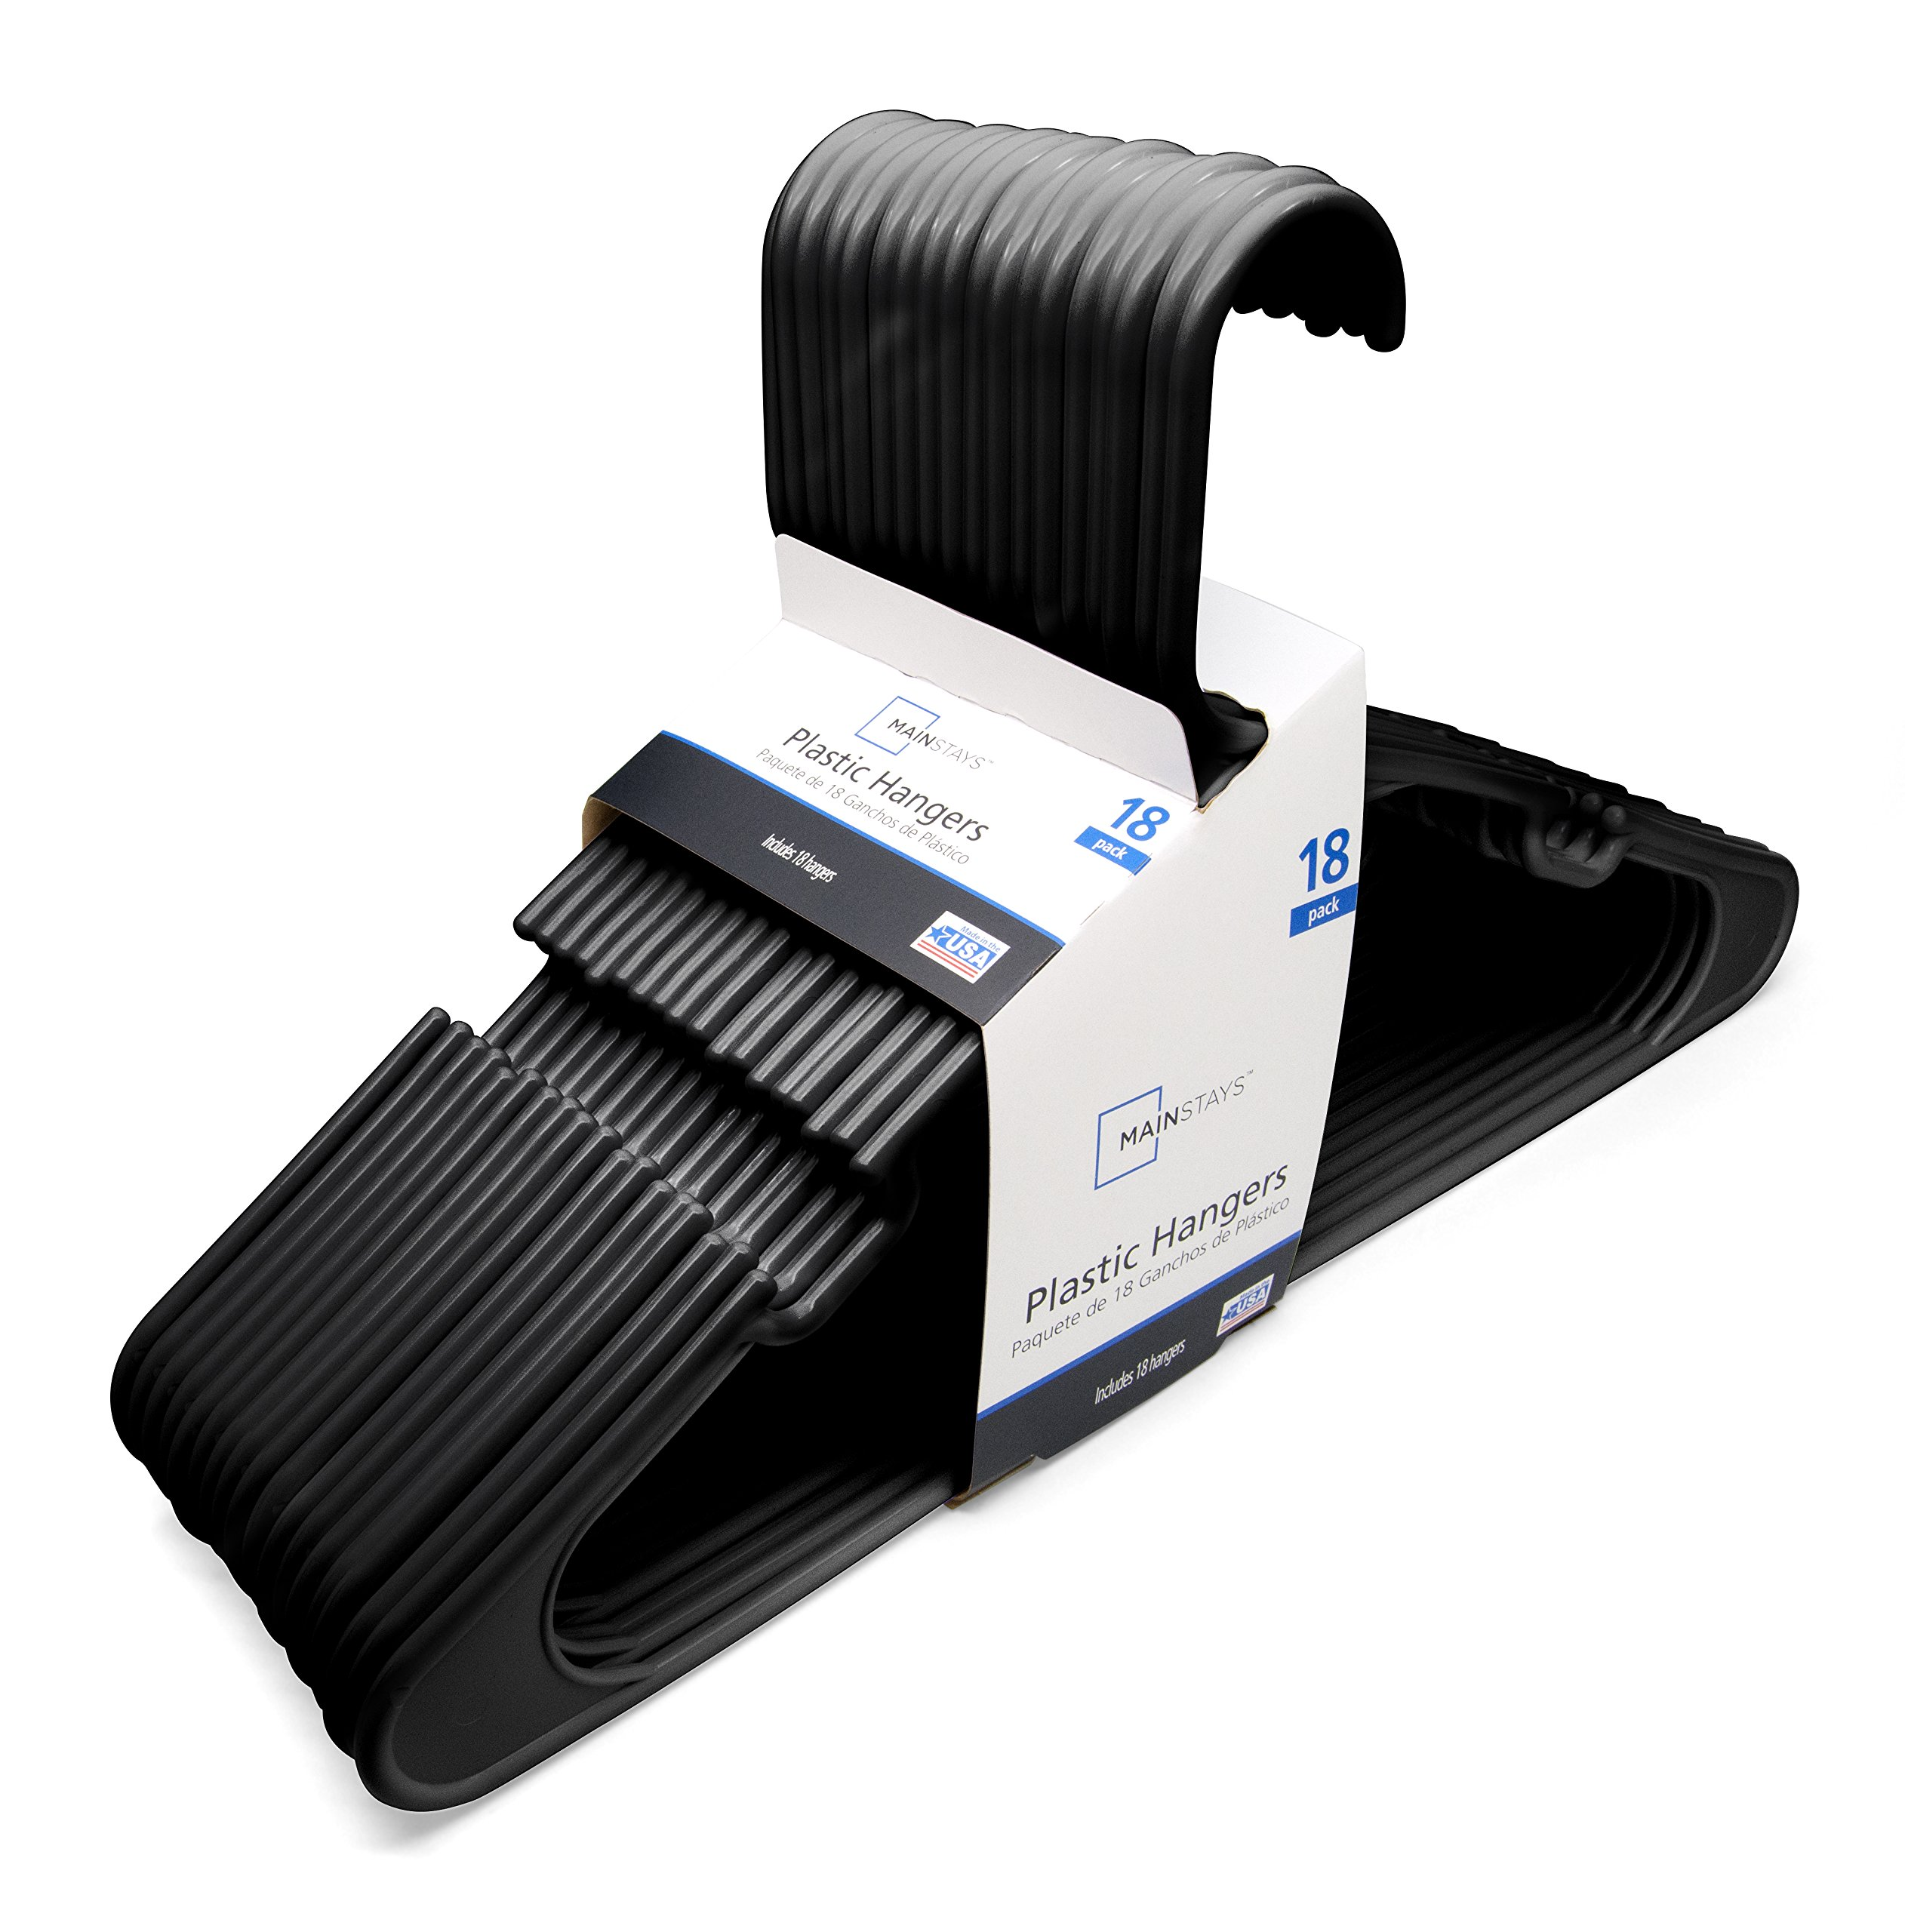 Mainstays 18-Pack Standard Plastic Hangers, Black by Mainstay